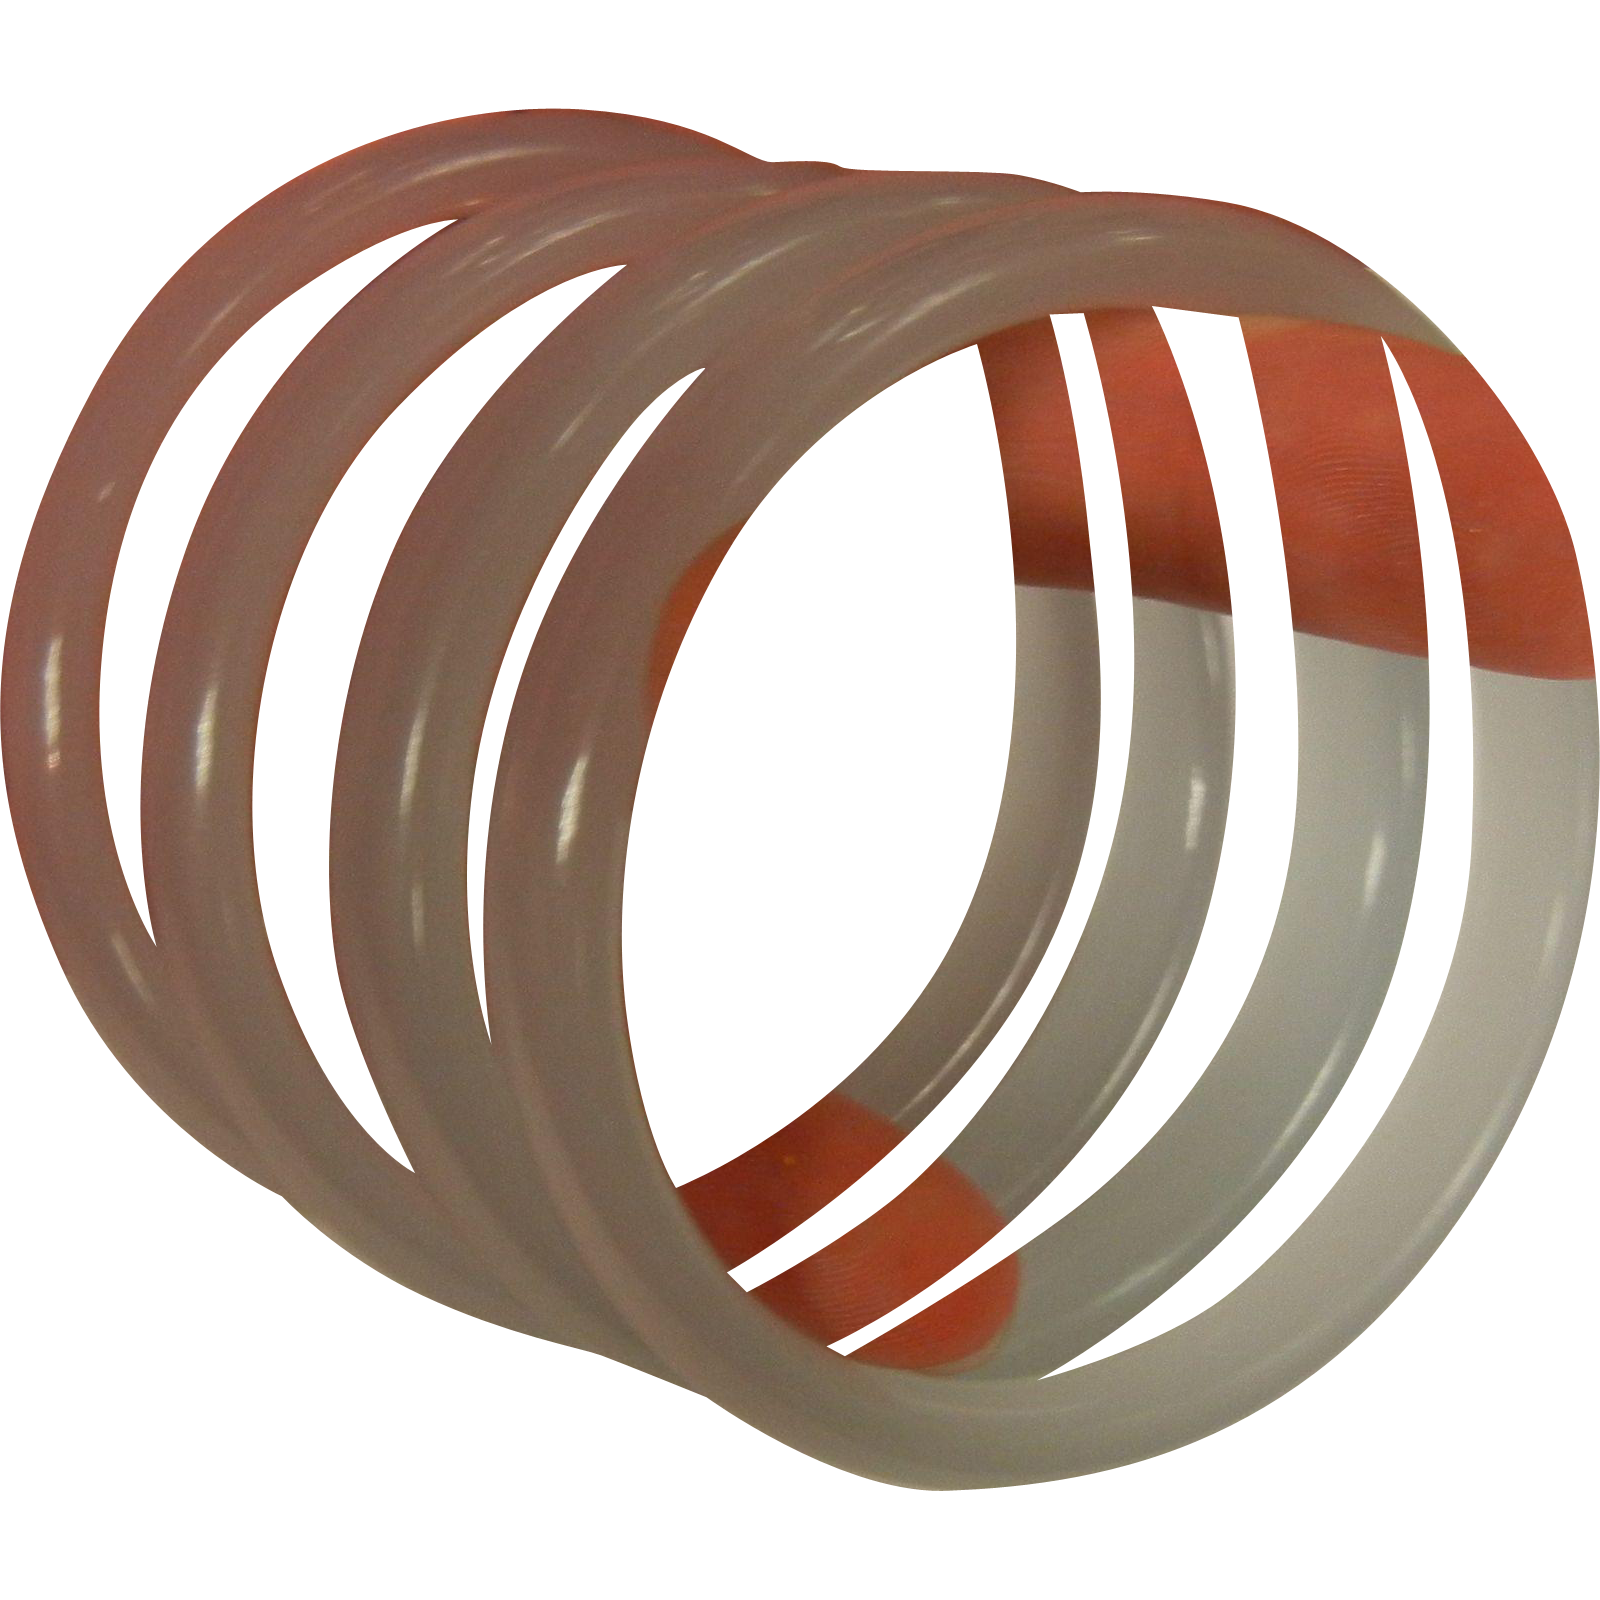 Four Color-Change Lavender Glass Bangle Bracelets